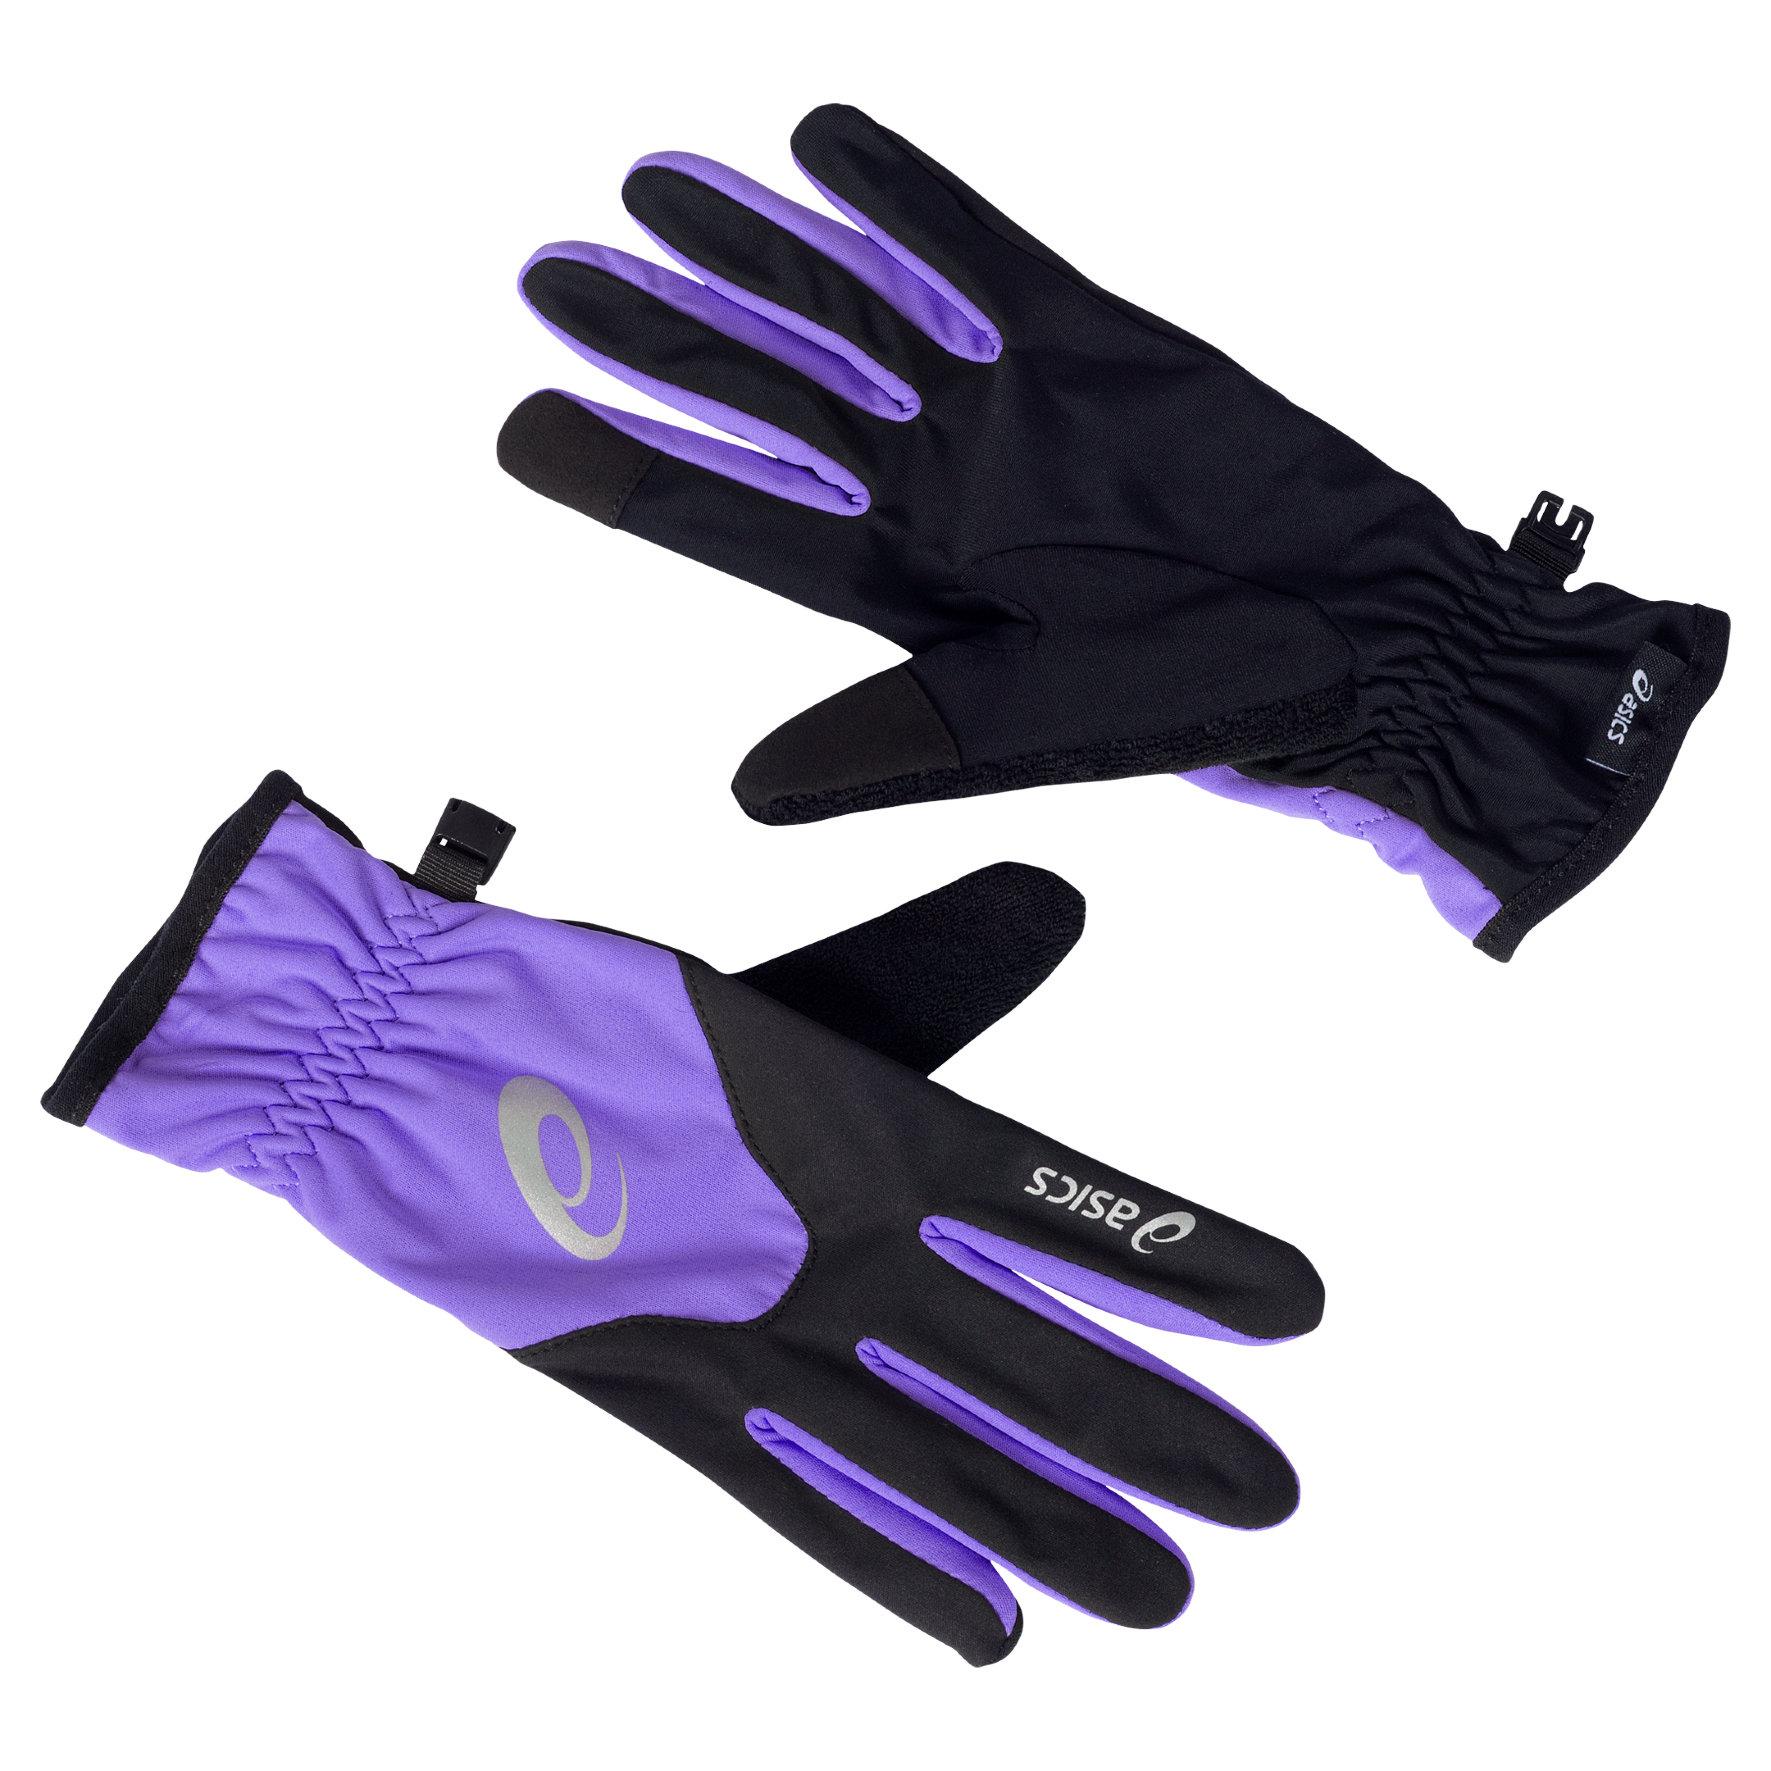 Asics Winter Gloves Woman in Purple